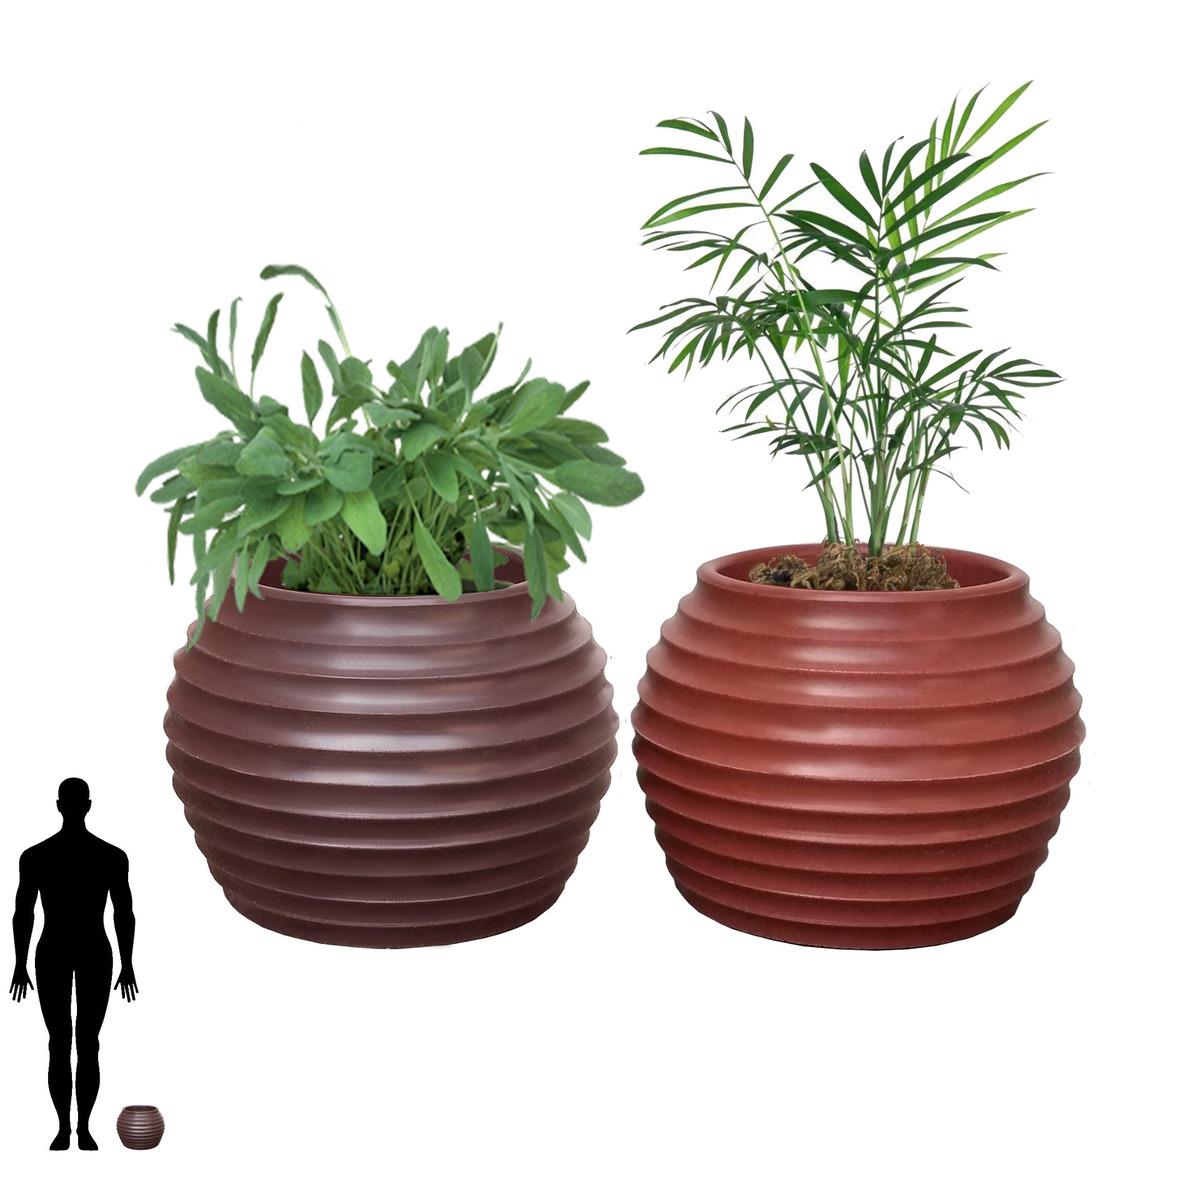 bd23138f0 2 vaso para decoracao jardim paisagismo branca pedra b 15x20. Carregando  zoom.